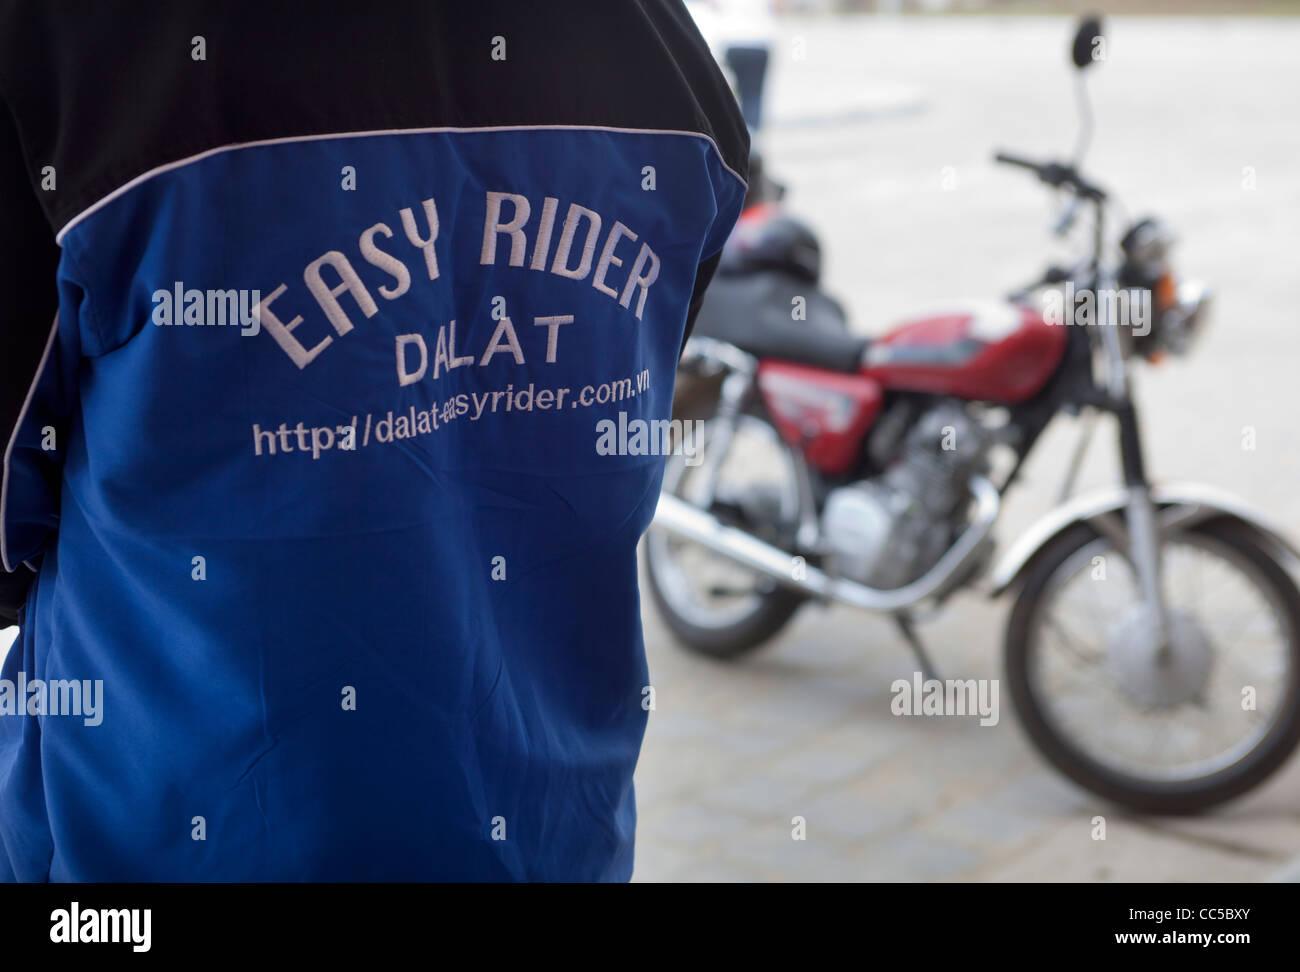 Easy Rider Motor Cycle Travel Guide Dalat Stock Photo